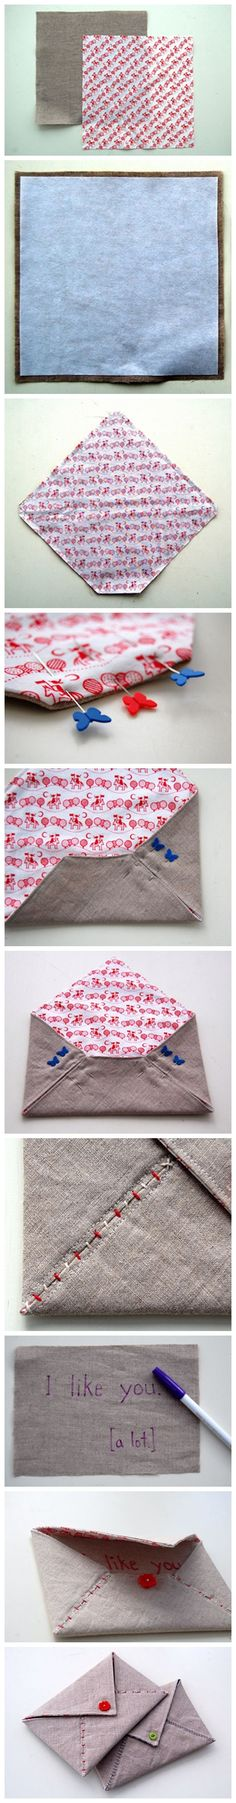 Cute fabric envelope